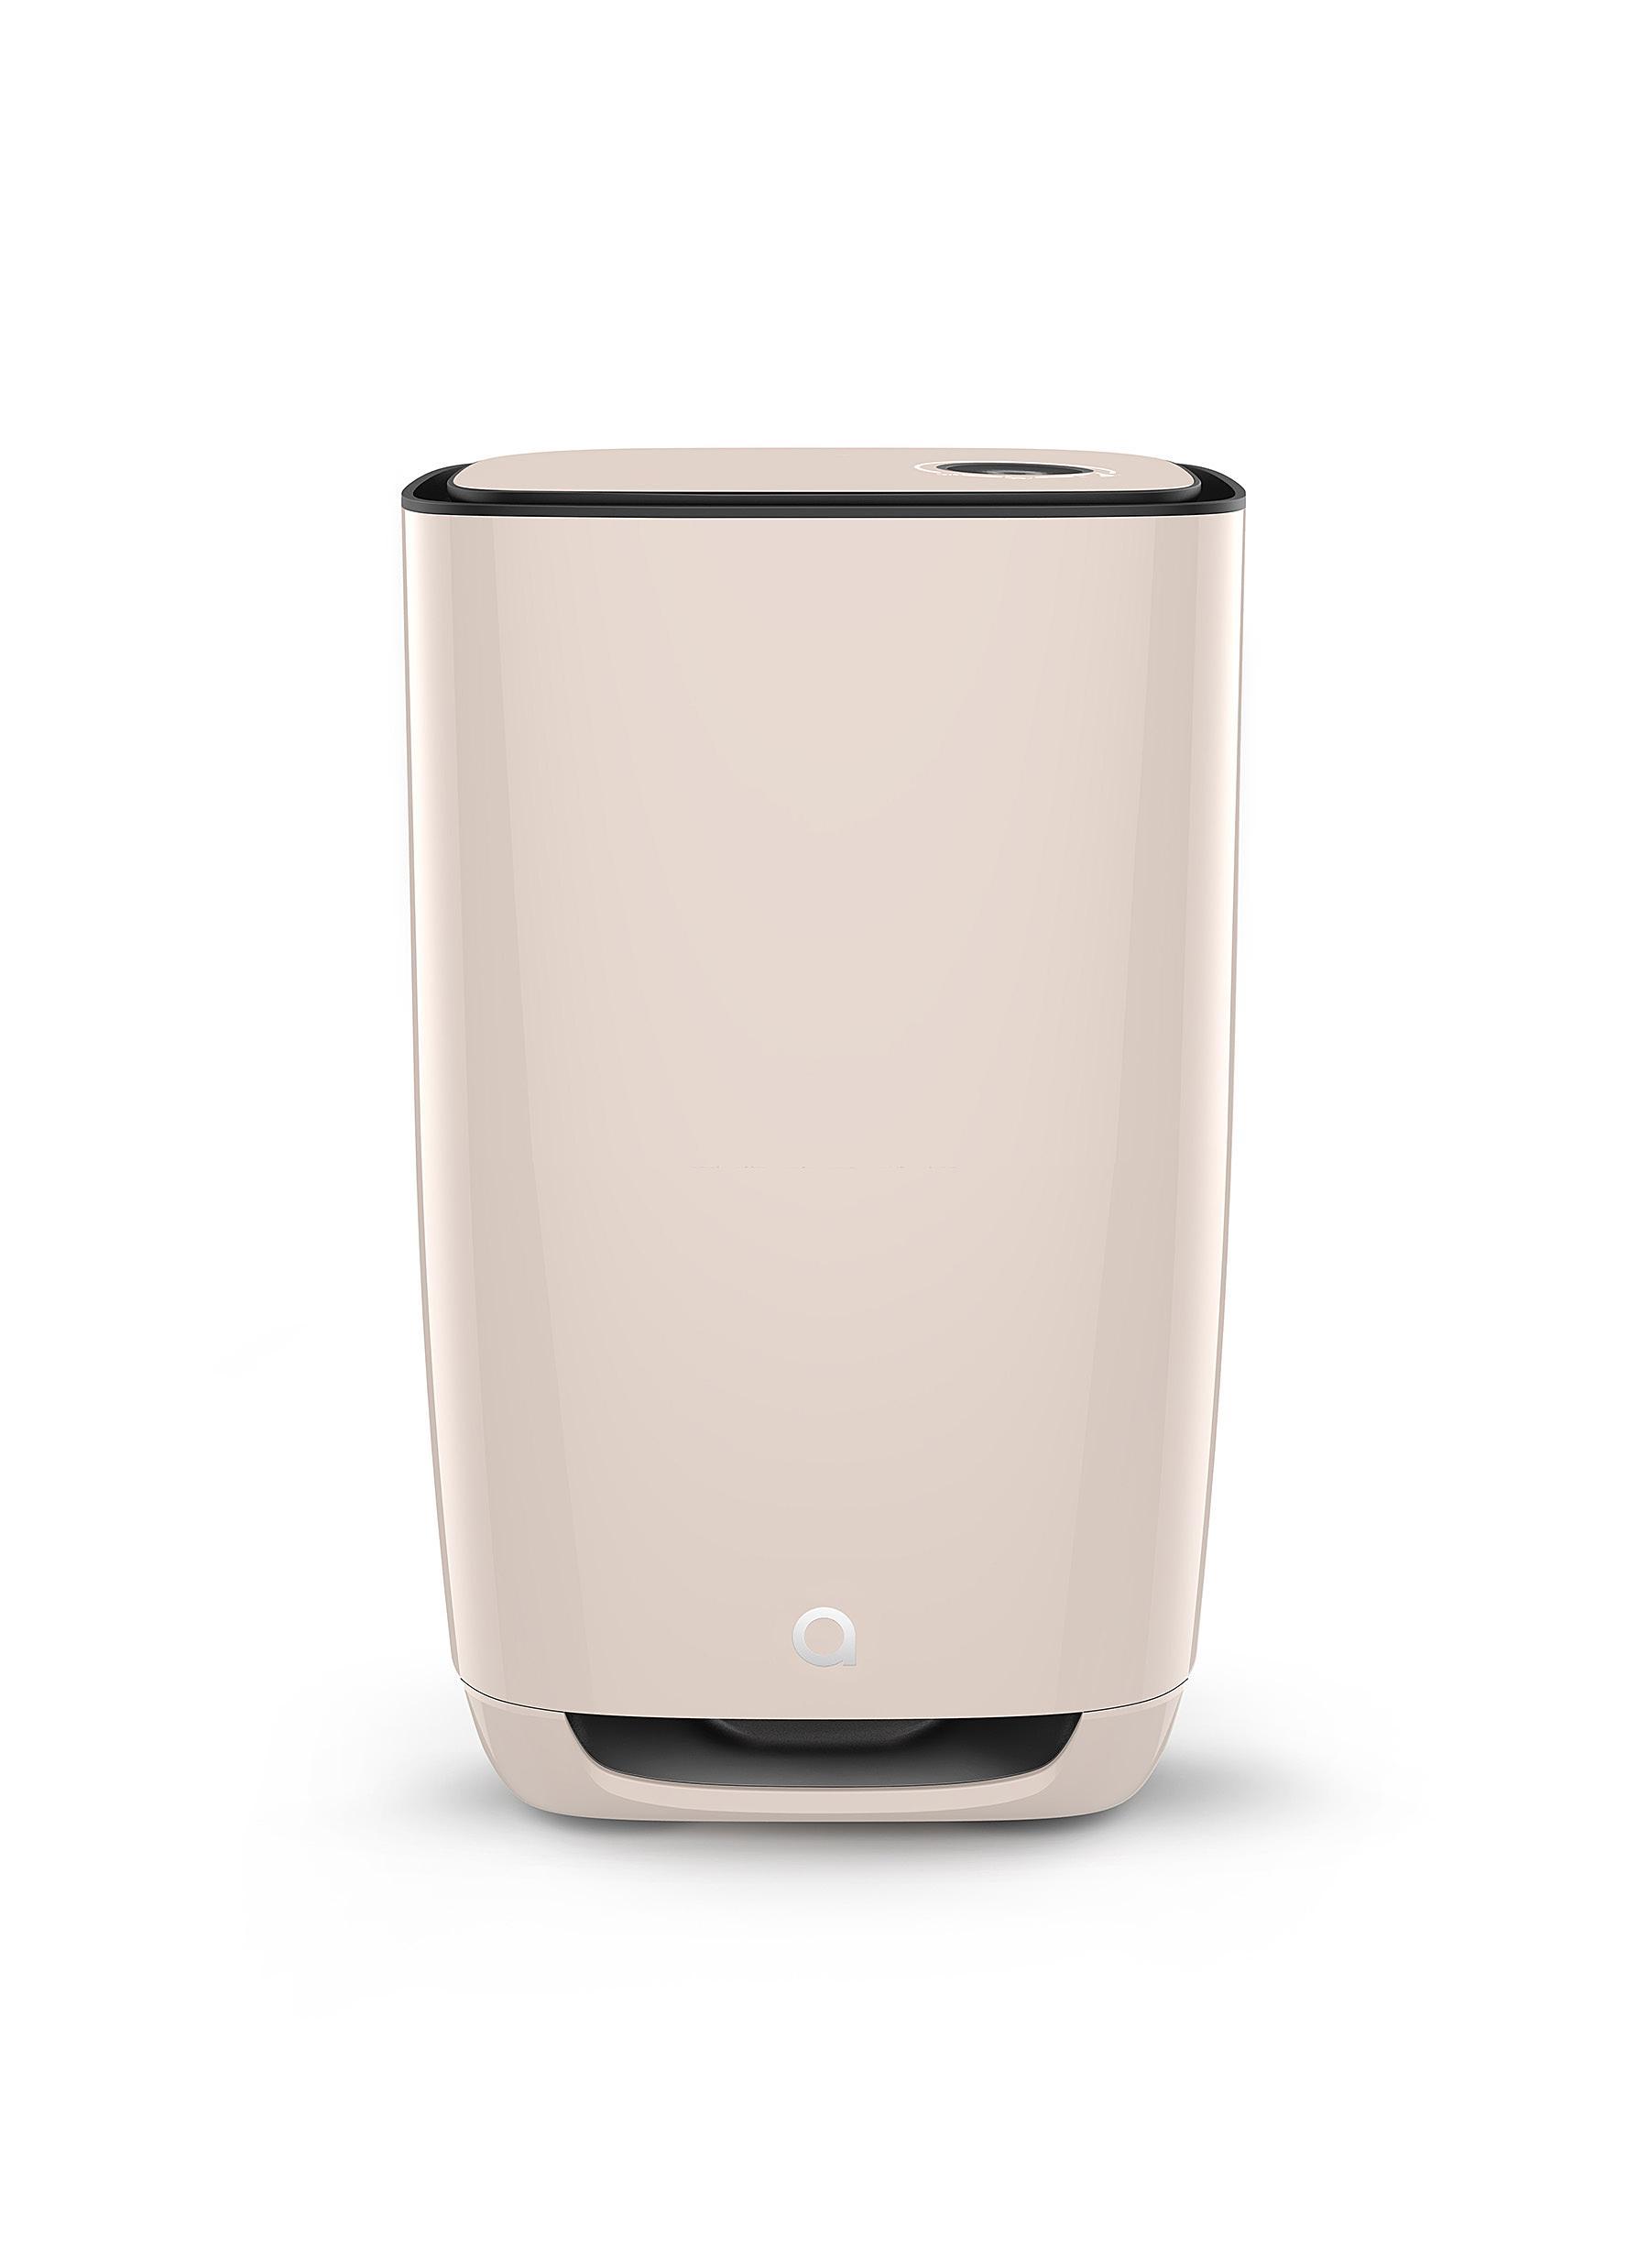 Aeris Aair Air Purifier - Pink Tint